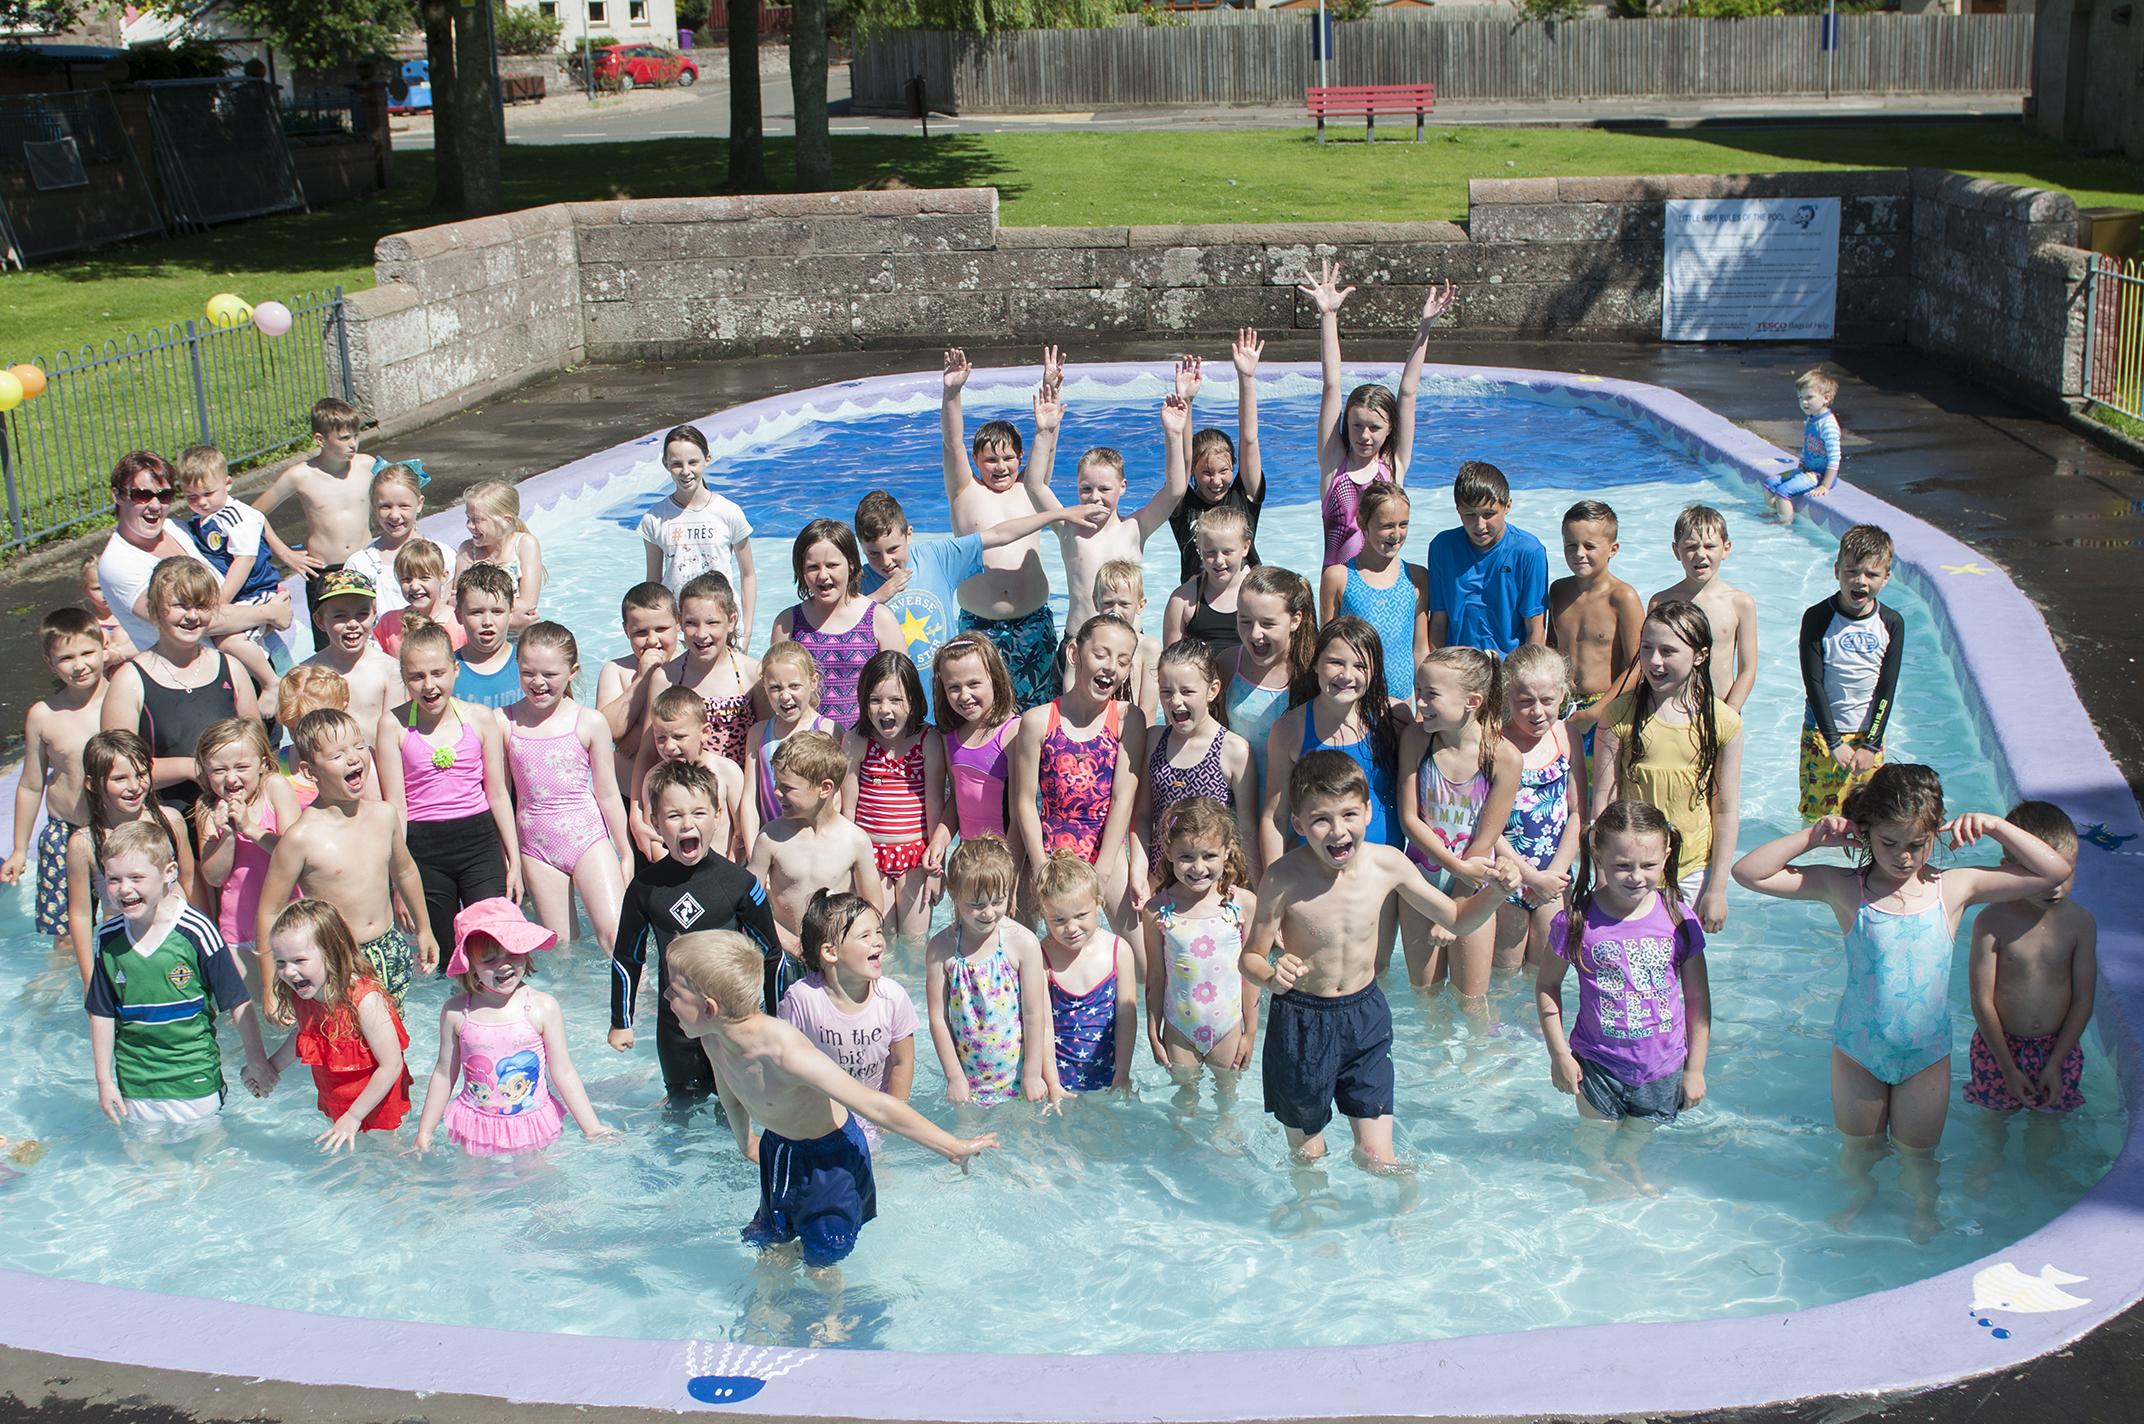 Kids at the rejuvenated pool